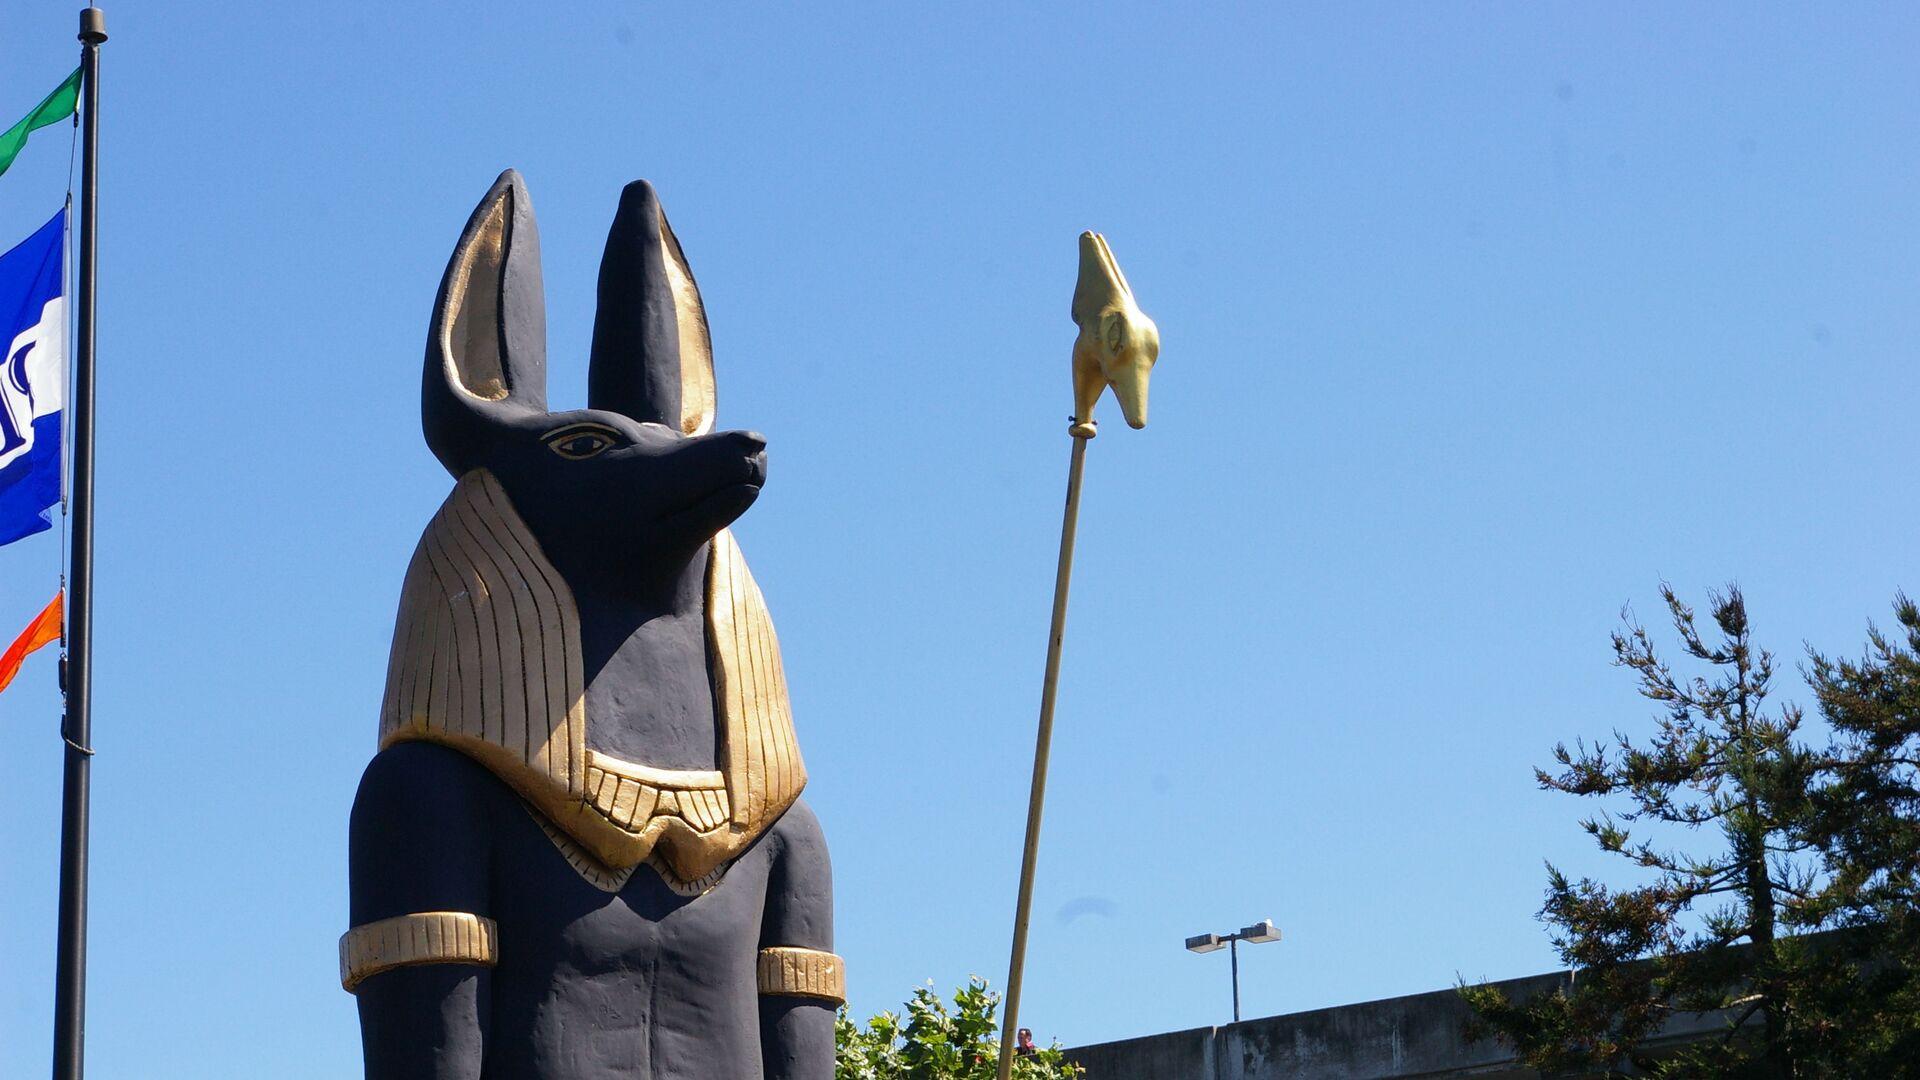 Estatua de Anubis, dios de la muerte egipcio - Sputnik Mundo, 1920, 26.08.2021